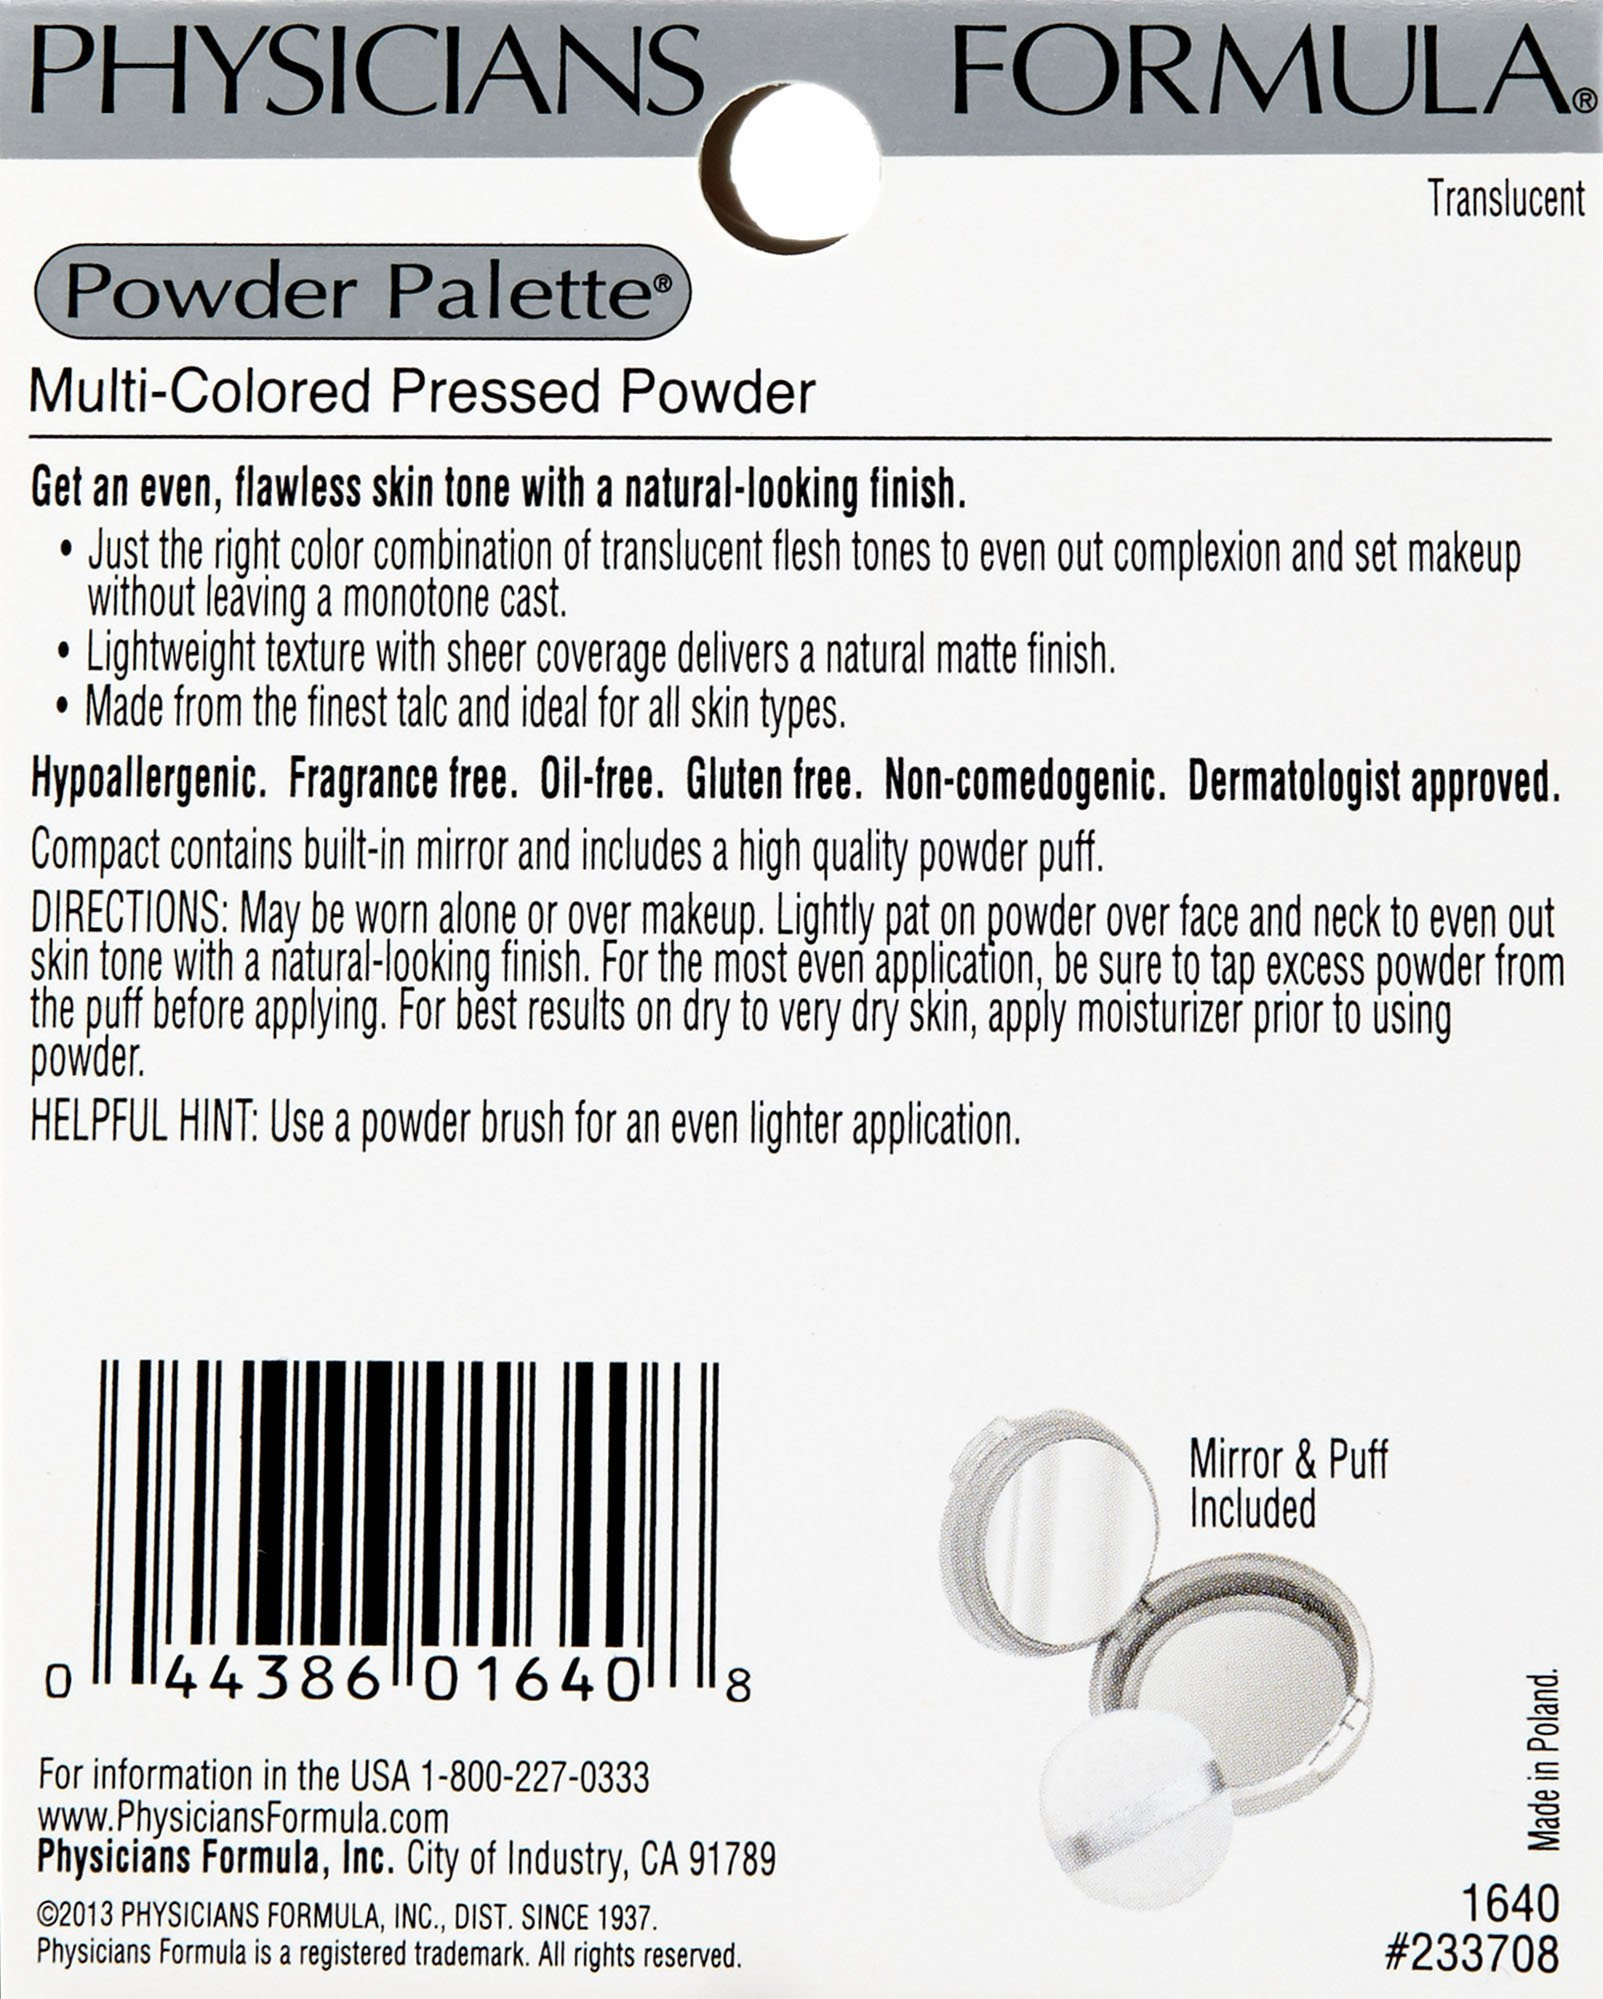 Physicians Formula Powder Palette Color Corrective Powders, Multi-colored Pressed Powder, Translucent, 0.3-Ounces by Physicians Formula (Image #3)